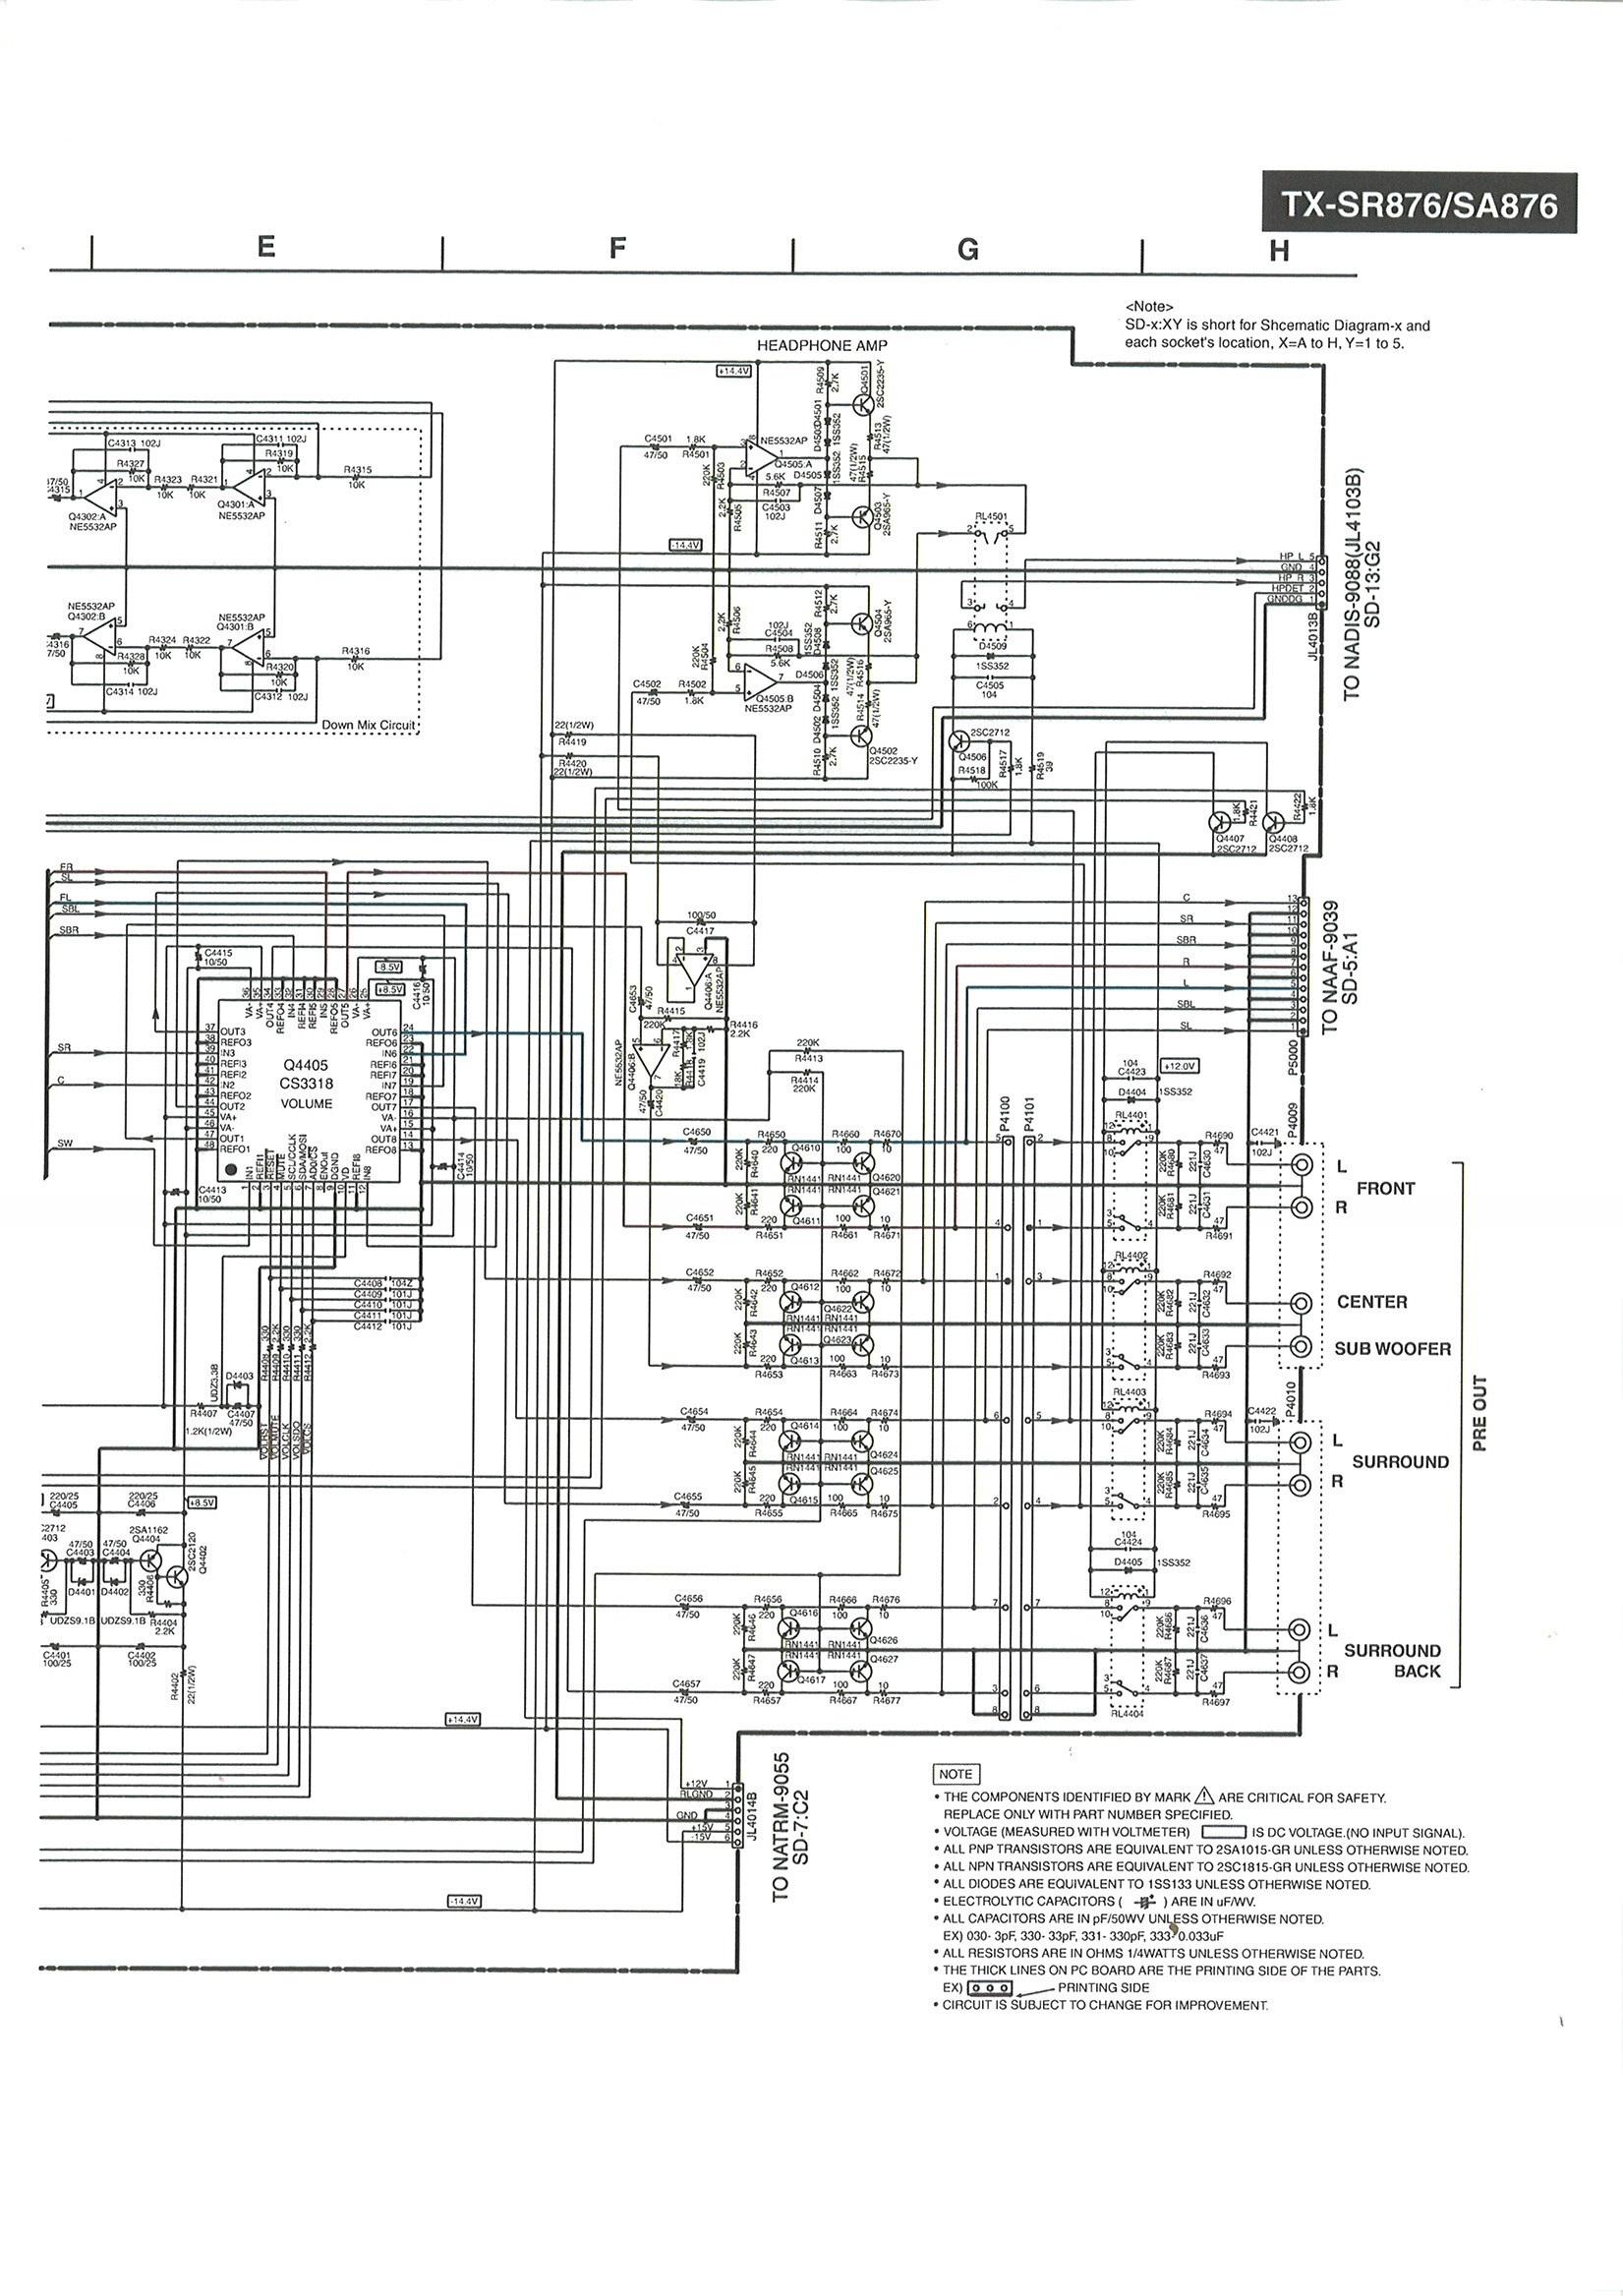 Analysis Of A Receivers Opamp Based Circuit Headphone Reviews And Audio Mixer Diagram With Ne5532 Onkyoheadphonejackampcircuit